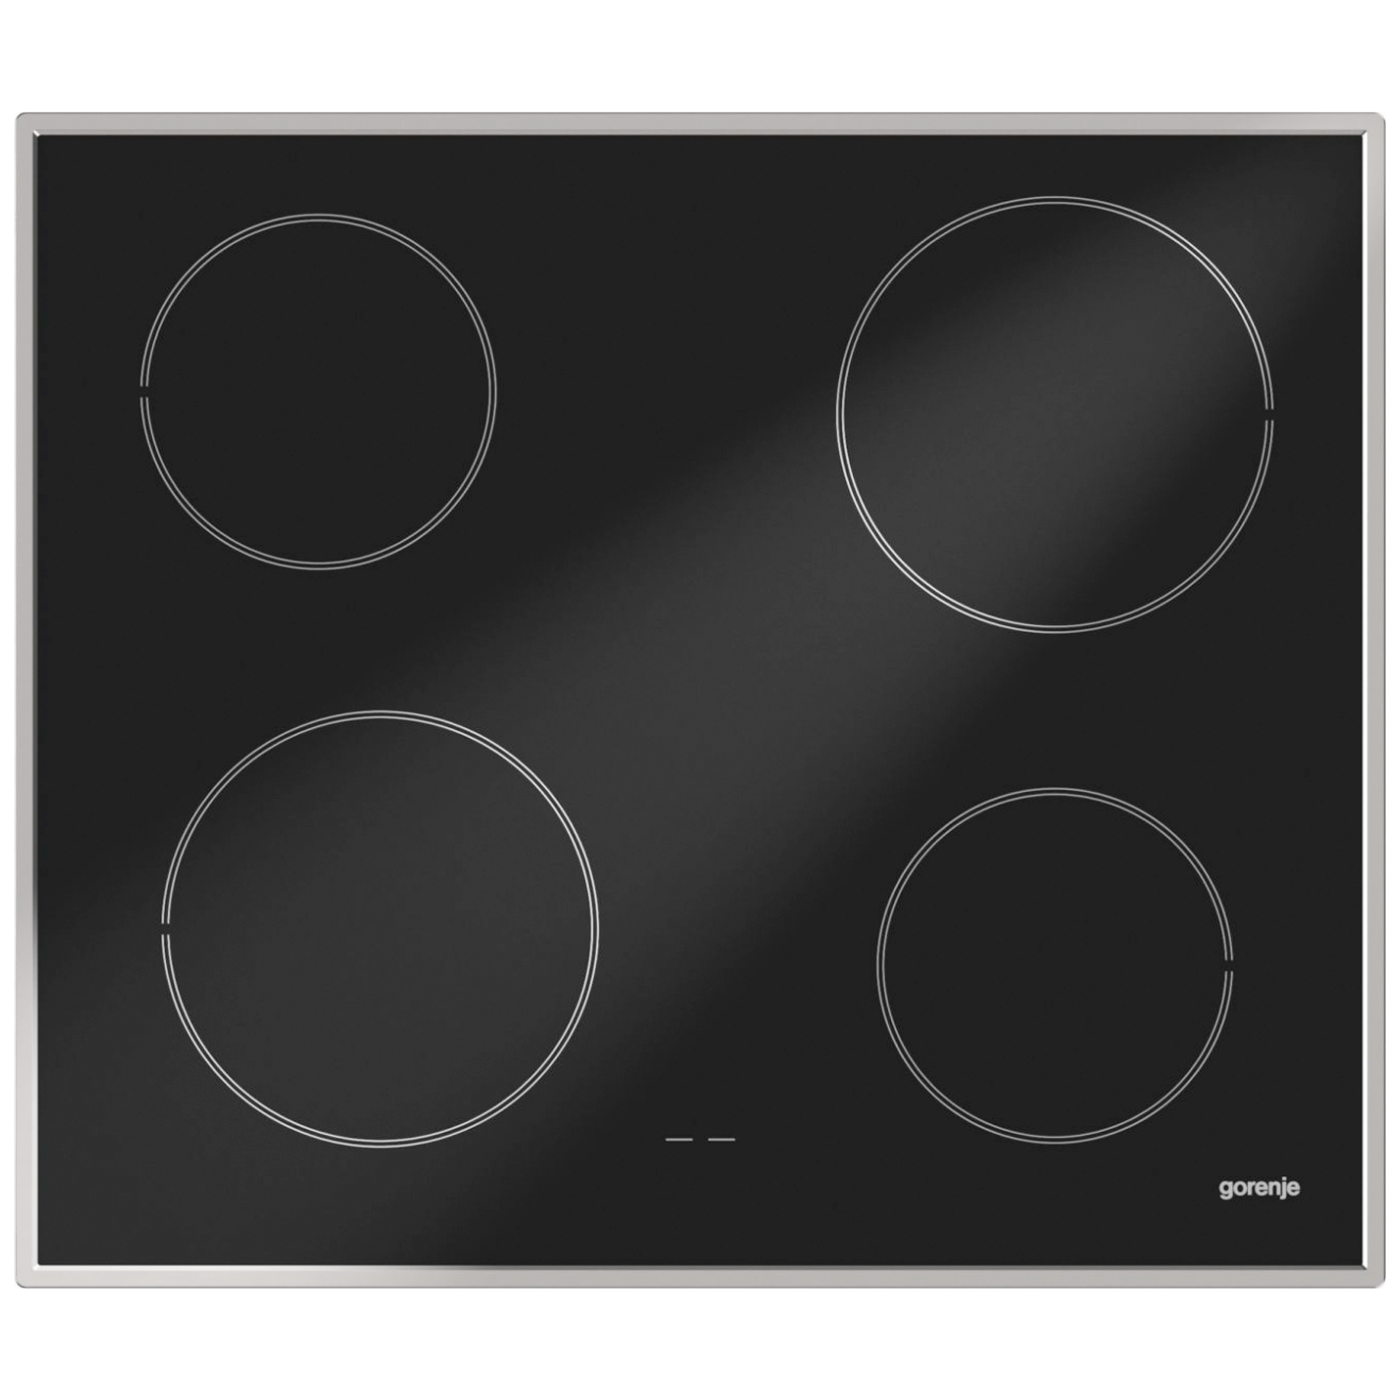 Ugradbena staklokeramička ploča za kuhanje, 6000W